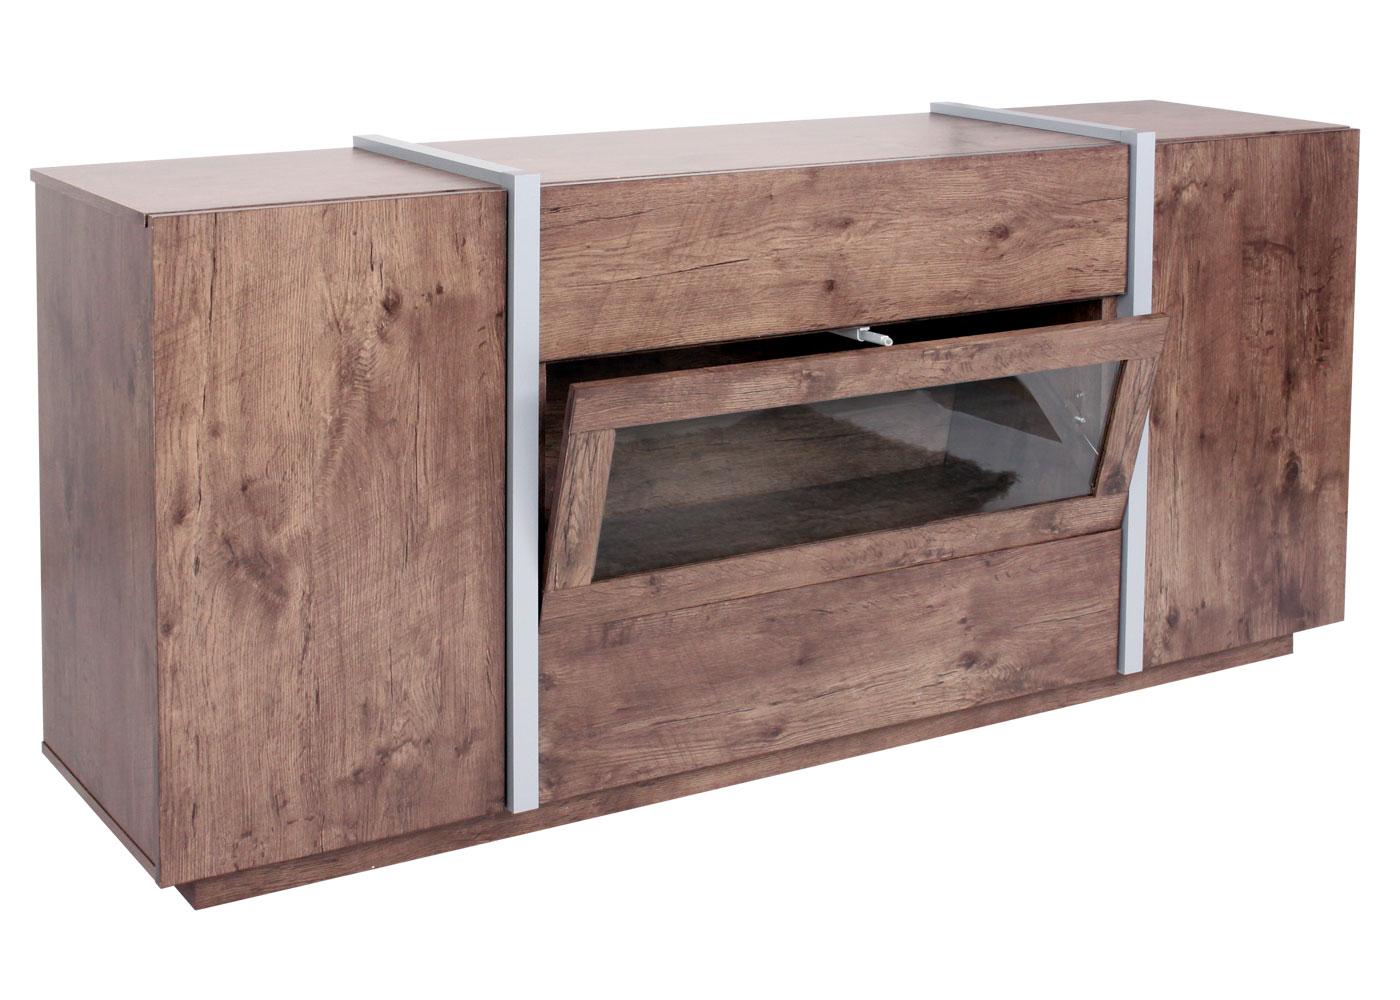 kommode hwc b47 sideboard anrichte schrank glast r push to open 170x42cm ebay. Black Bedroom Furniture Sets. Home Design Ideas